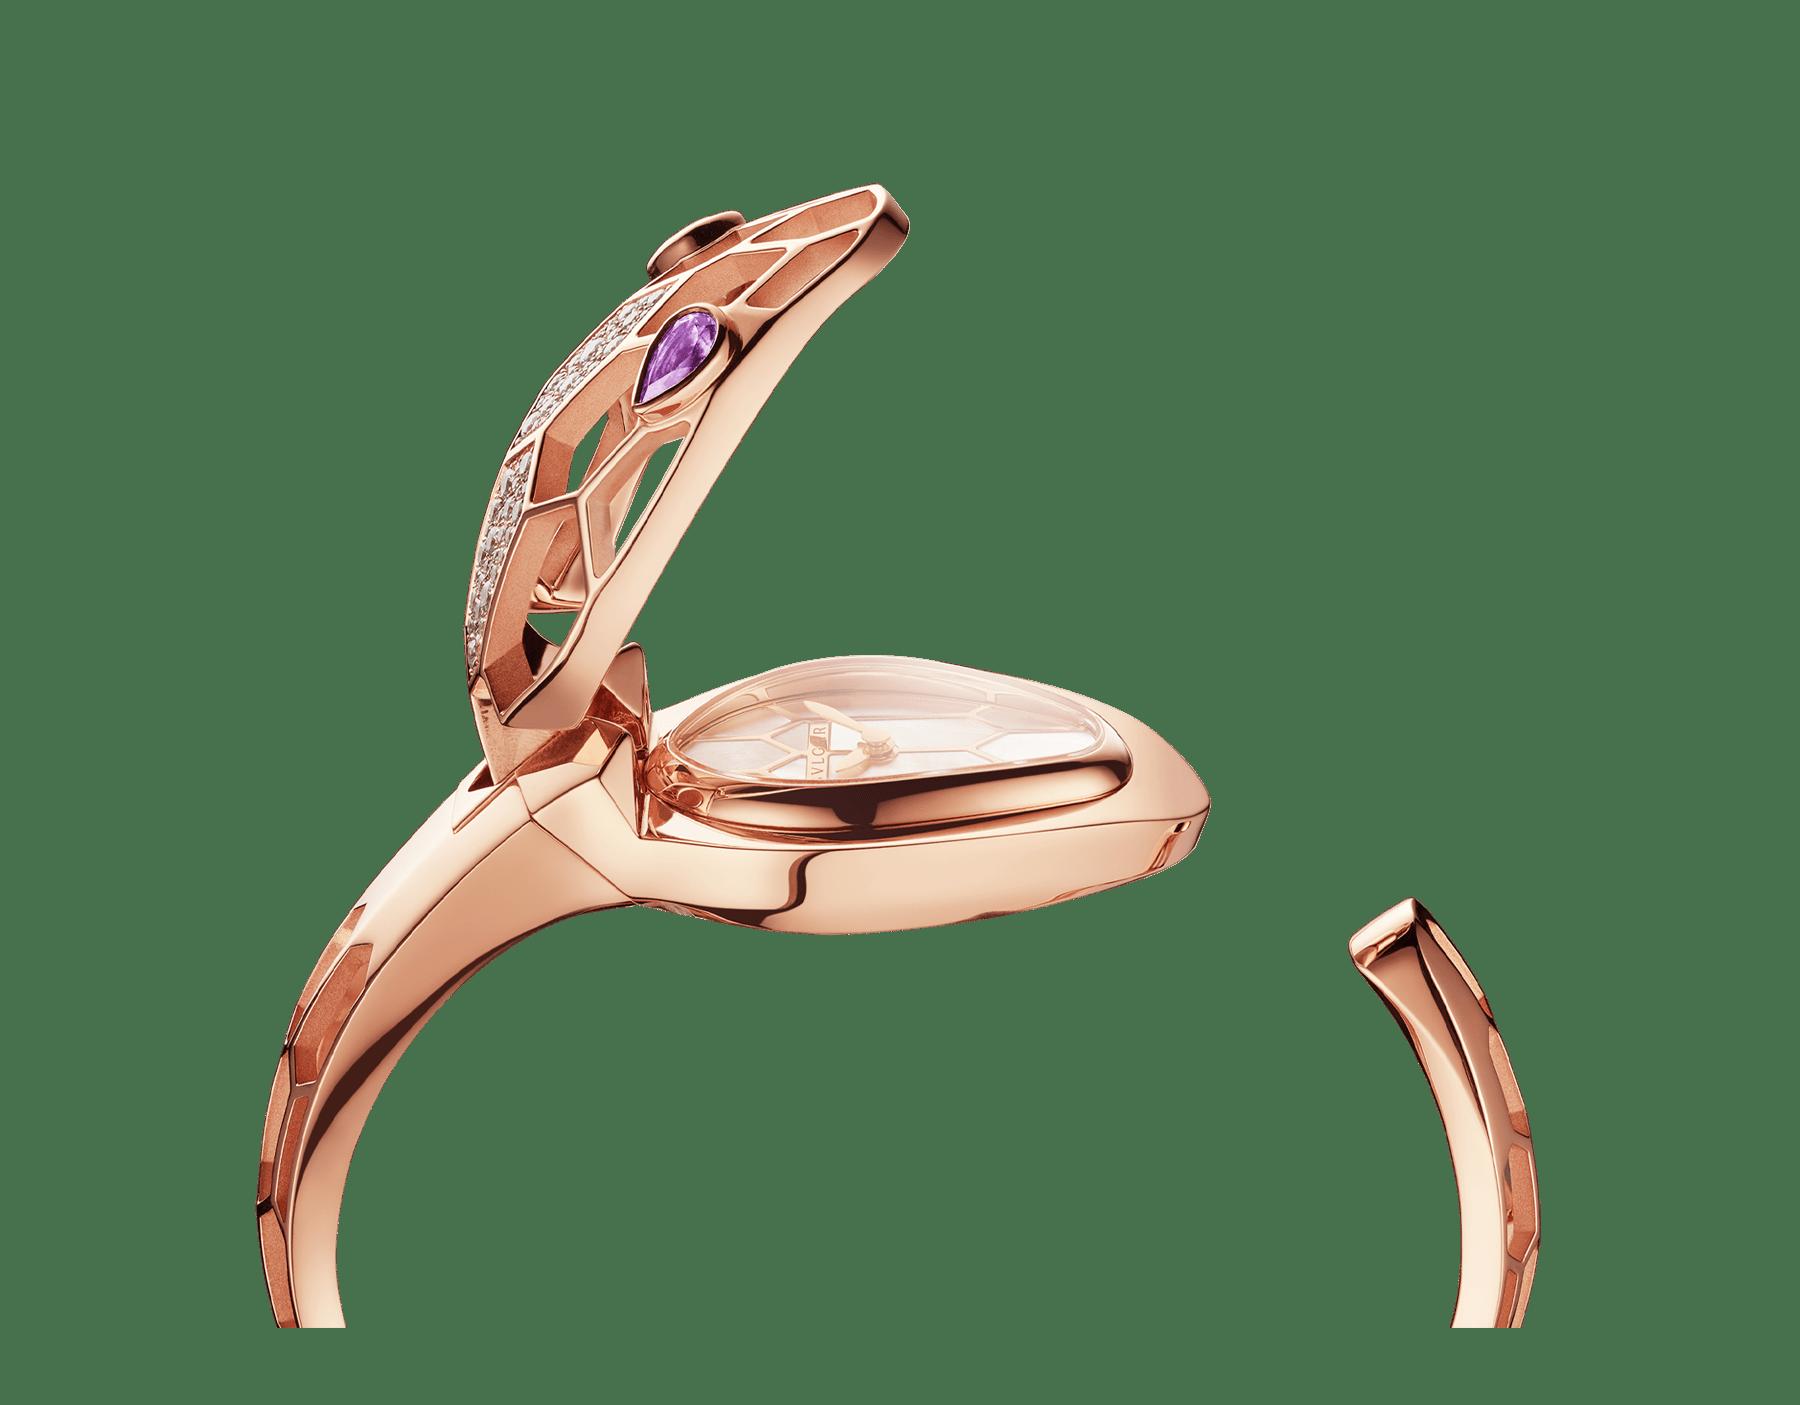 Serpenti Misteriosi Secret 腕錶,18K 玫瑰金鏤空錶殼鑲飾圓形明亮型切割鑽石,白色珍珠母貝錶盤,18K 玫瑰金鏤空手鐲式錶帶,蛇眼鑲飾梨形紫水晶。M 尺寸。 SrpntMister-SecretWtc-rose-gold image 9